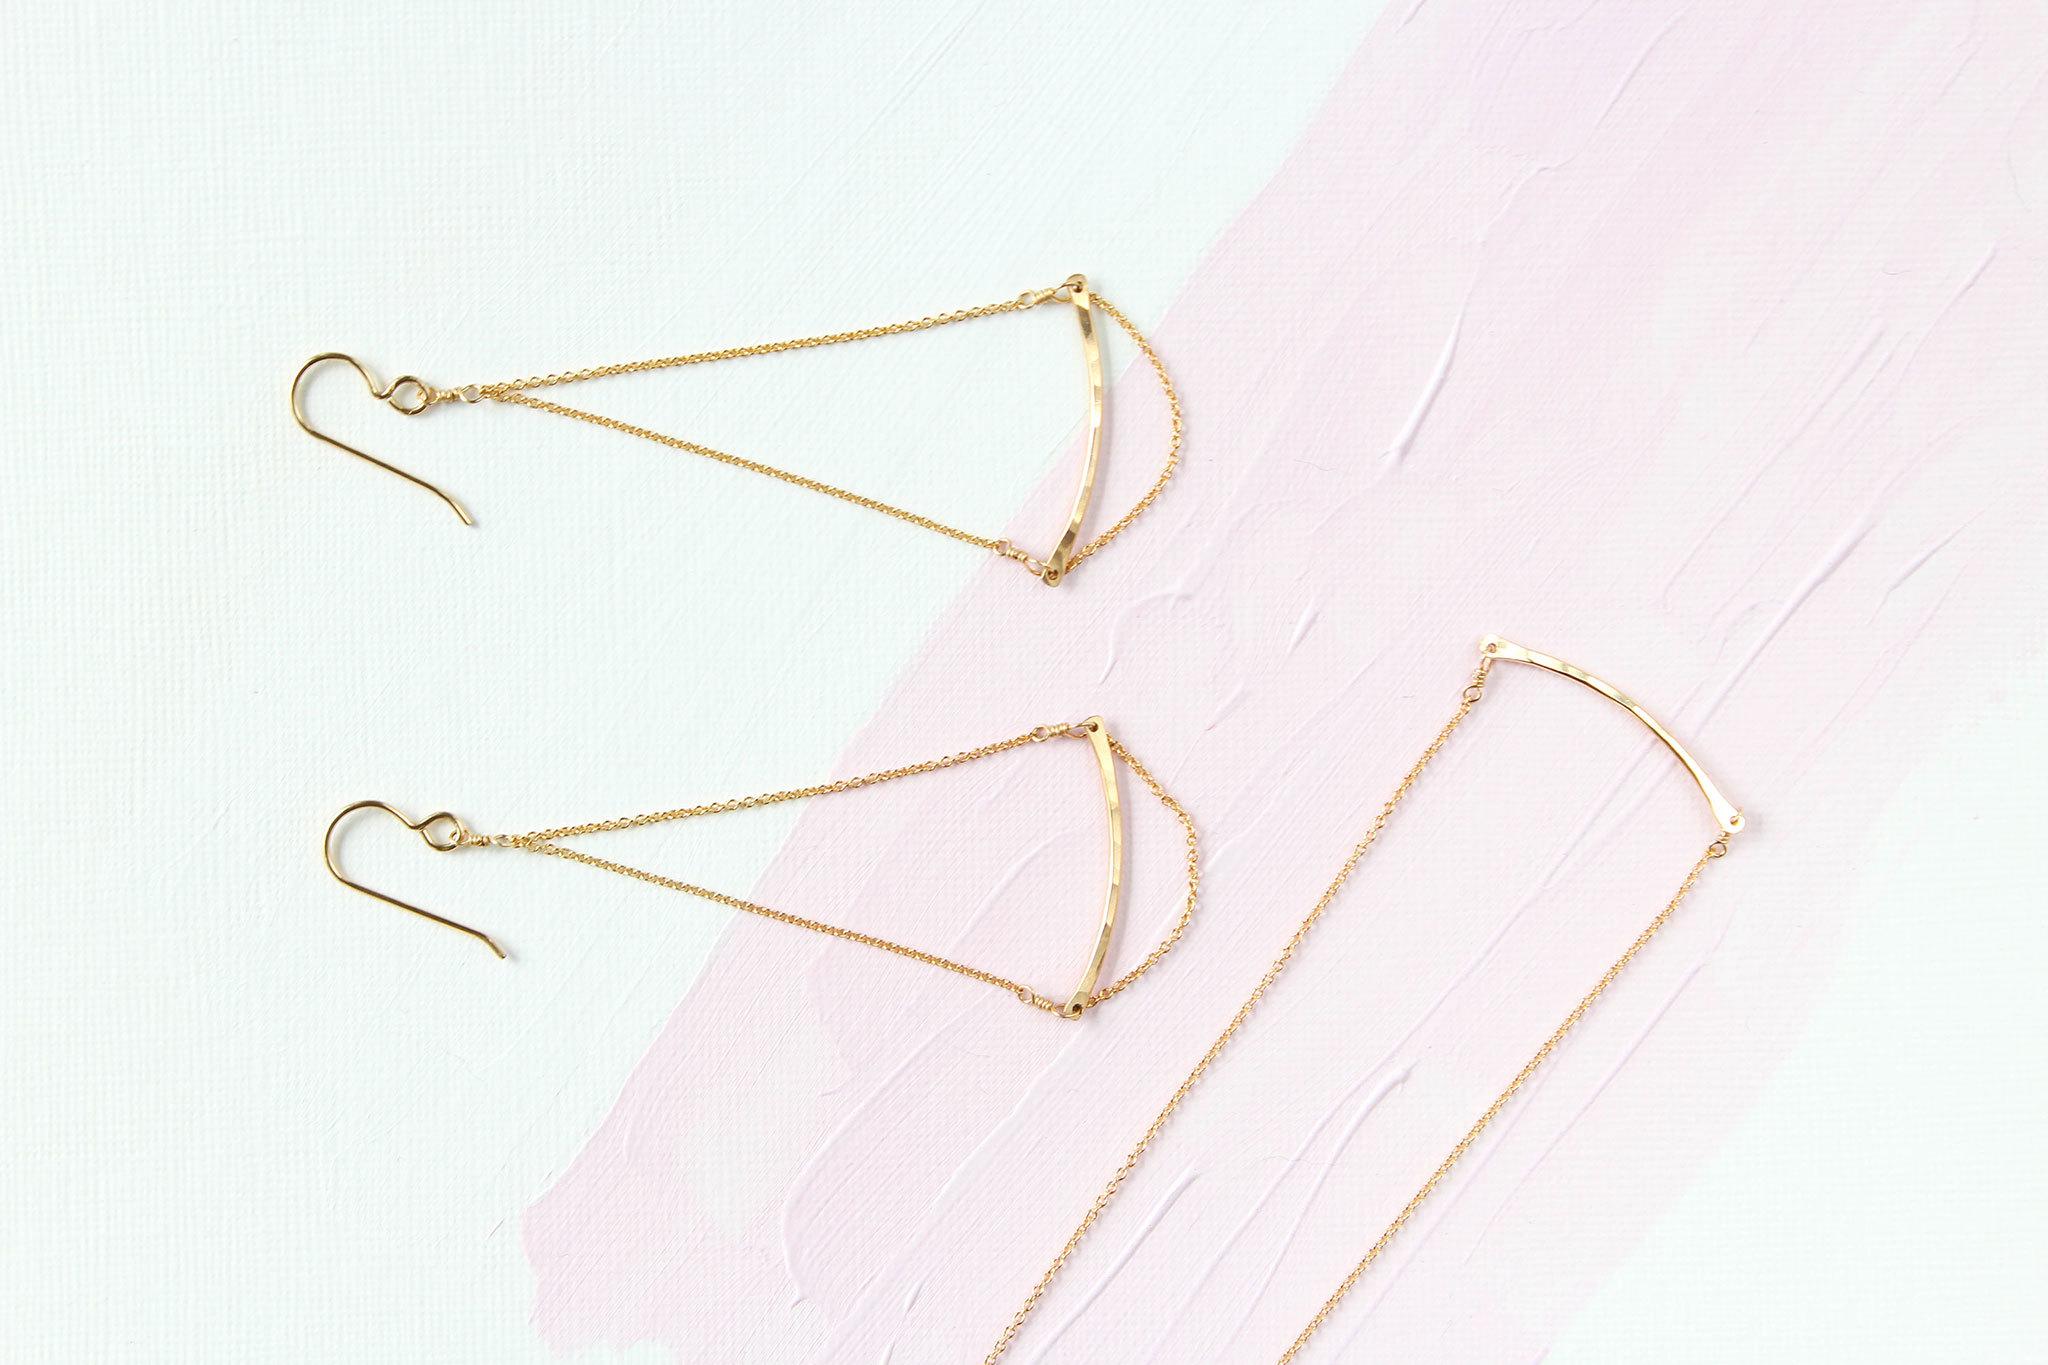 Britta Ambauen Jewelry